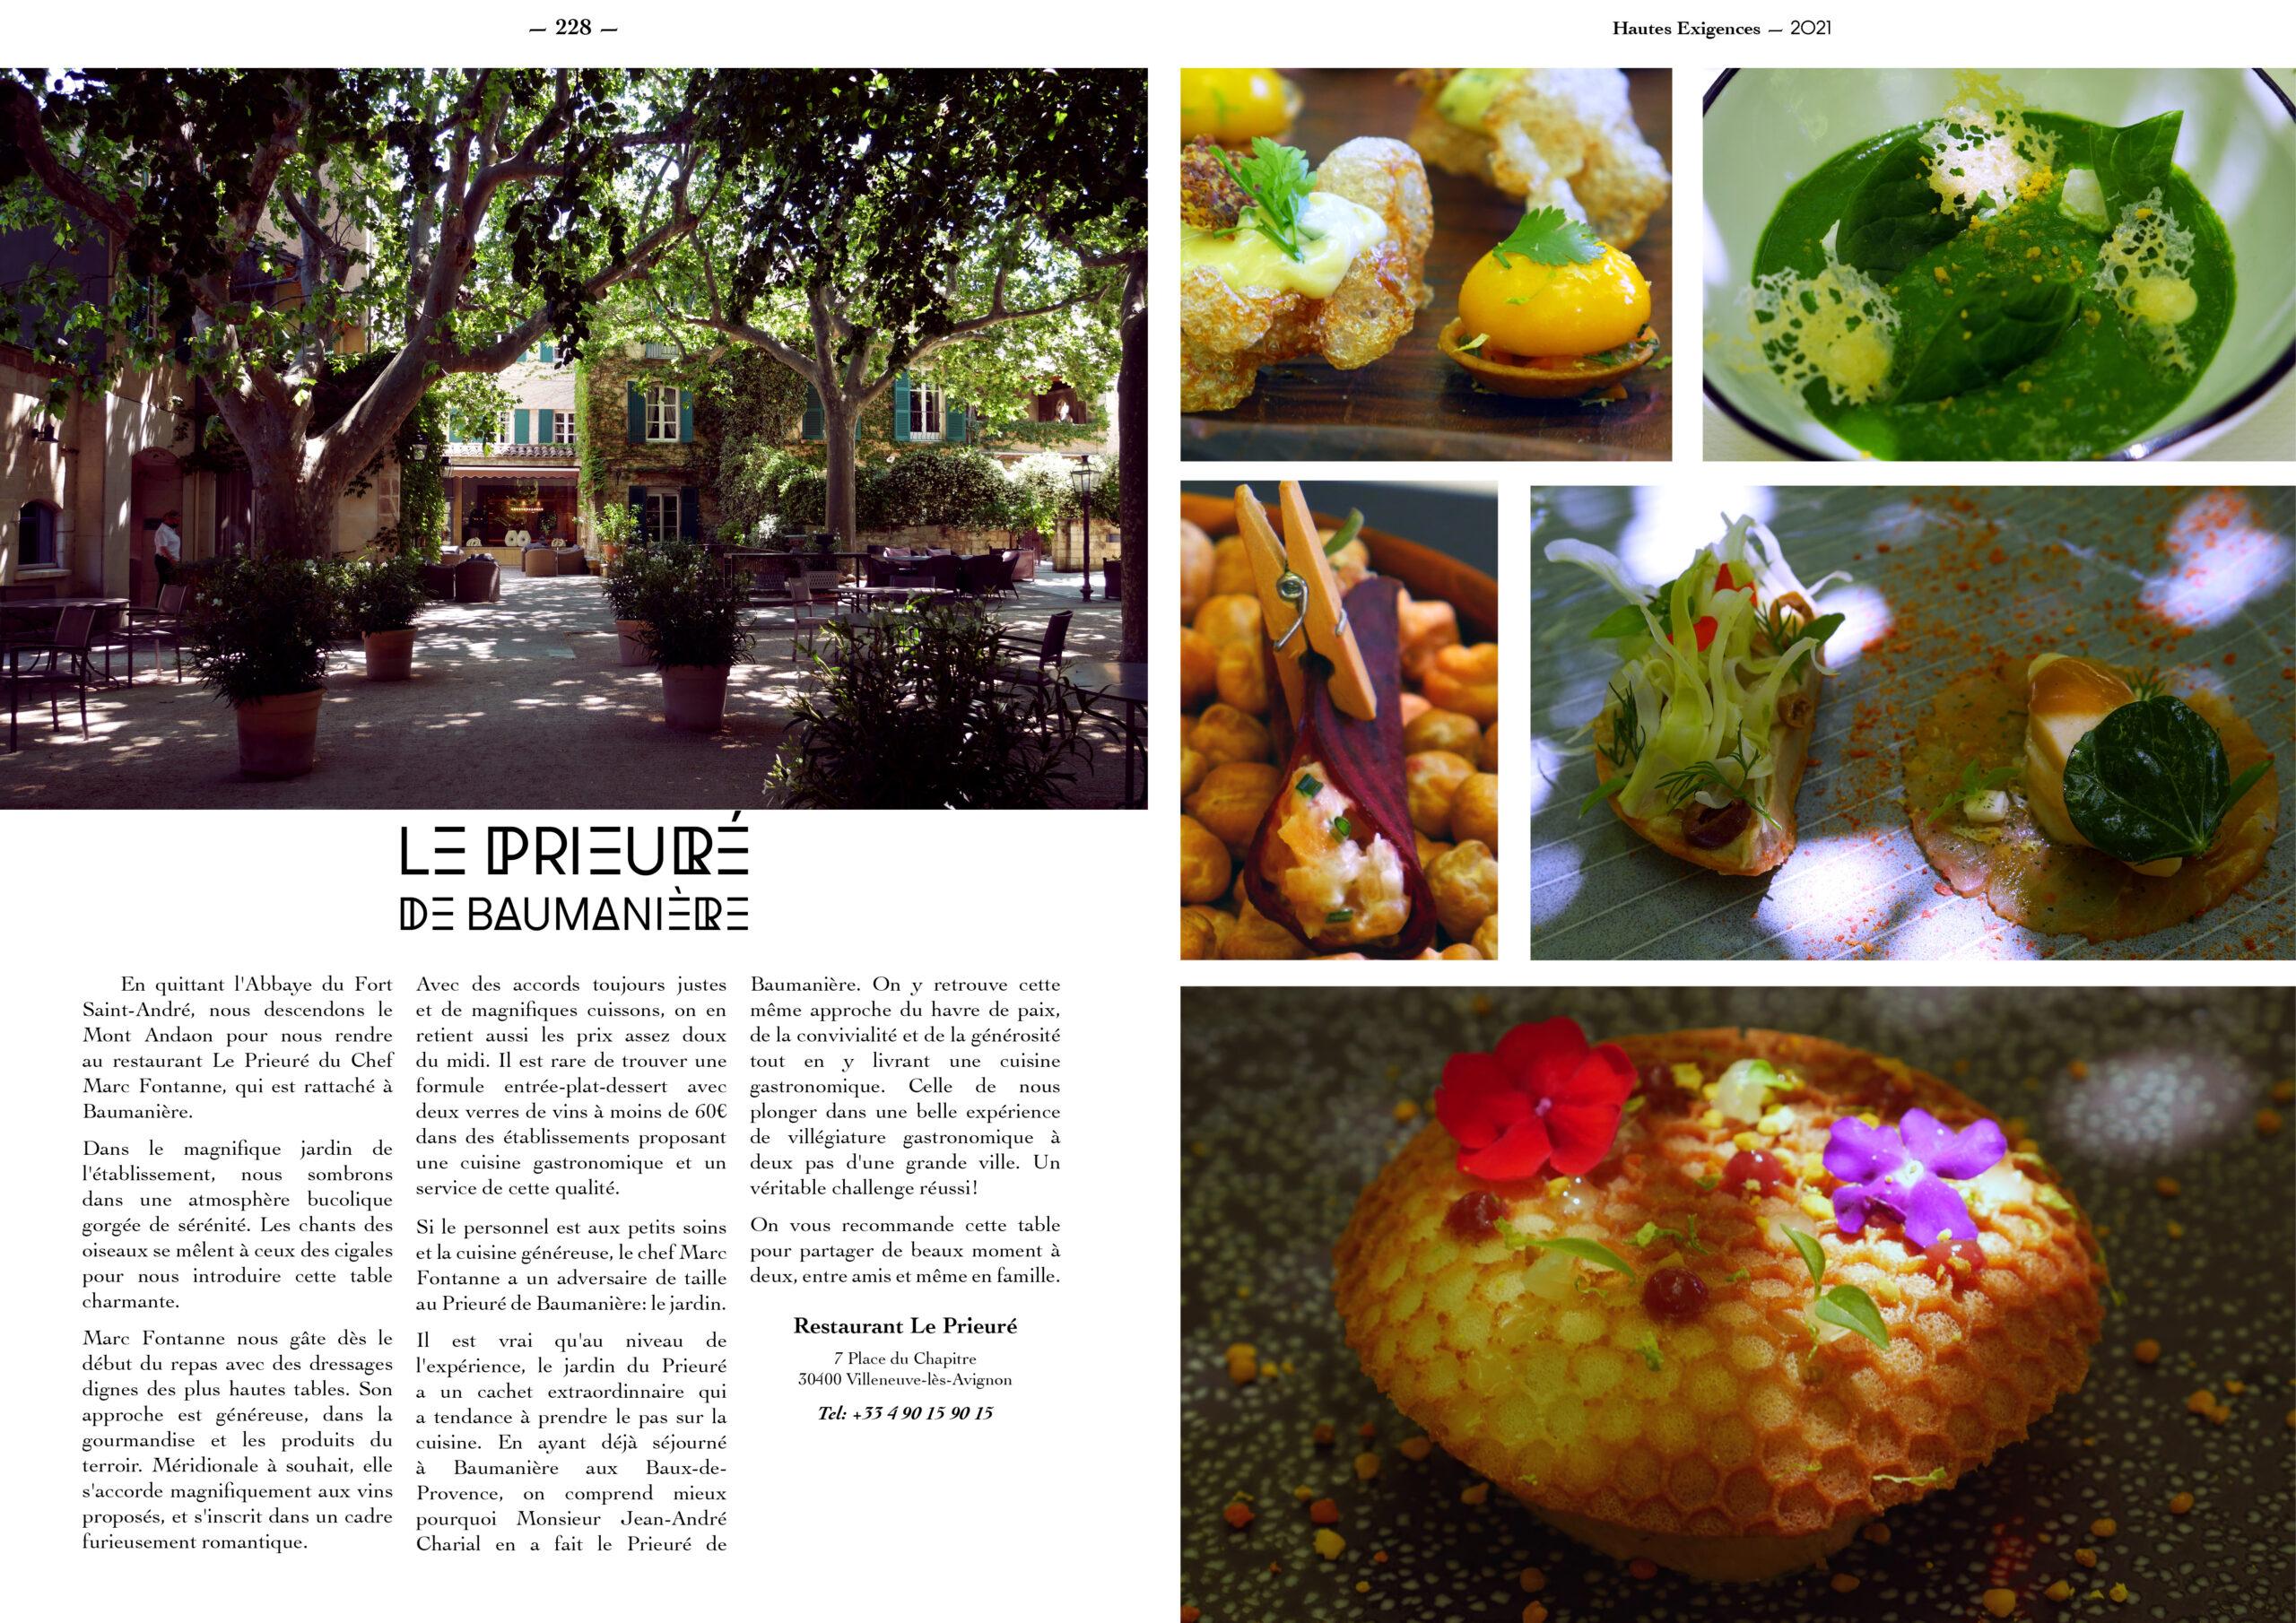 Hautes Exigences Magazine Hors Serie 2021 page 226-227